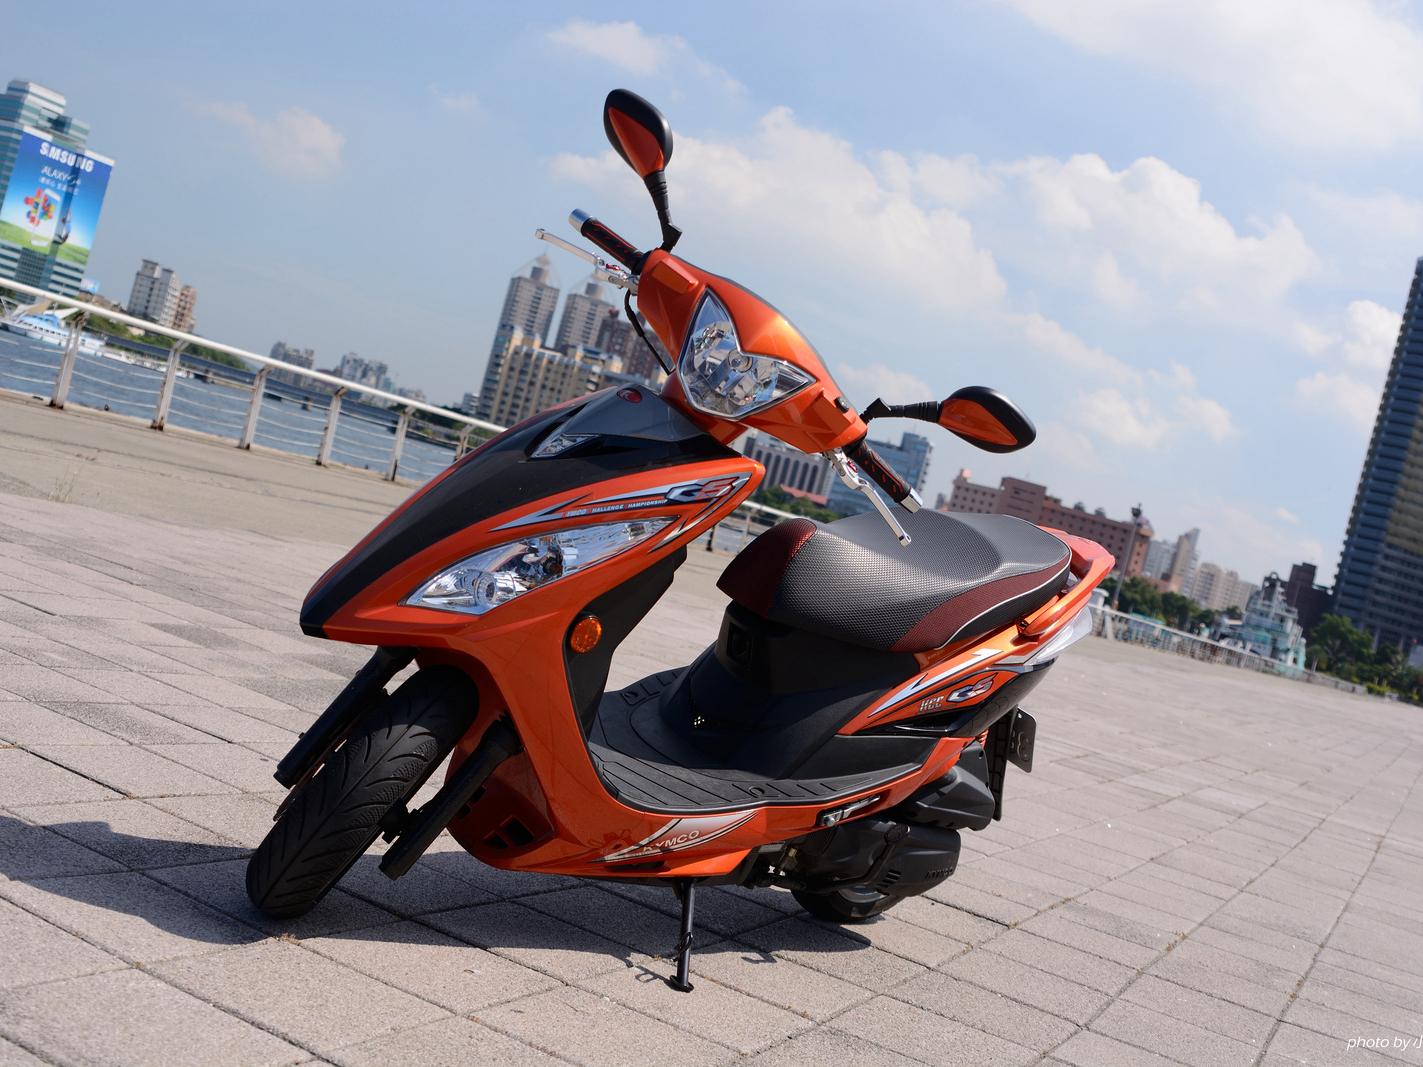 R Nine T >> 【光阳 超5 G5 150 Fi】_摩托车图片库_摩托车之家